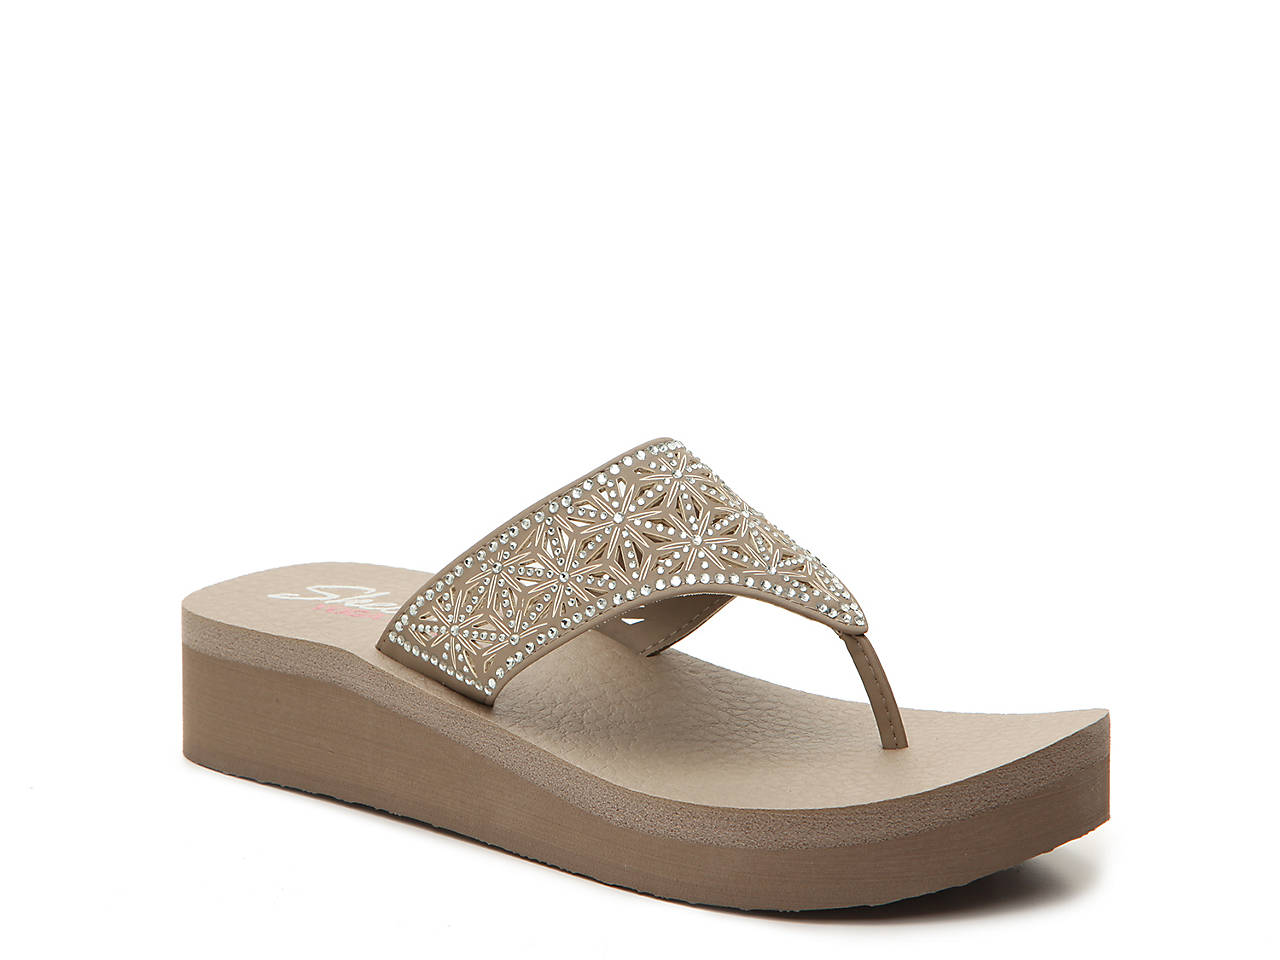 520b6dfe771d Skechers Cali Vinyasa Glass Star Wedge Flip Flop Women s Shoes